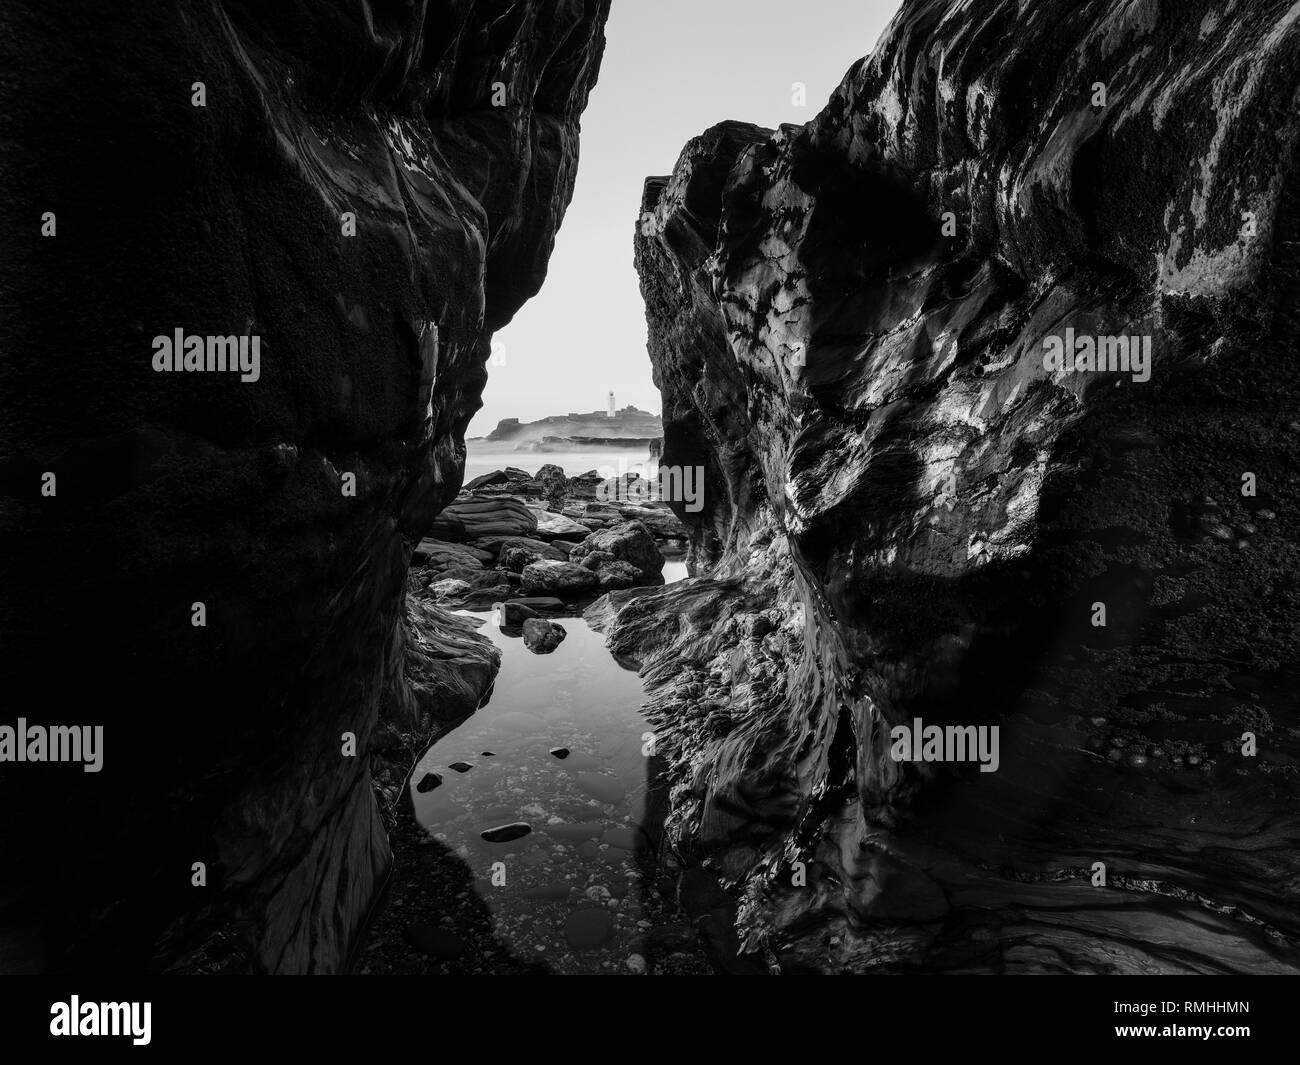 Godrevy Rocks View through rugged rocks towards Godrevy Lighthouse - Stock Image